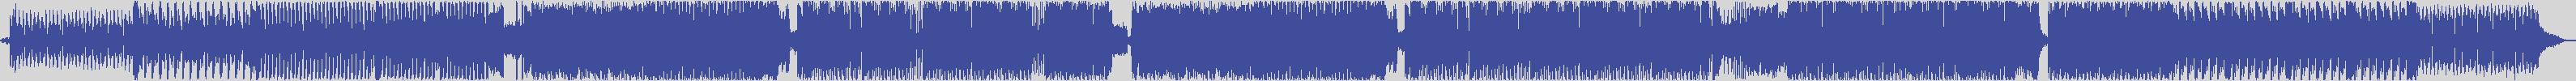 hitaly_muzik [smile1057] Baby Ray - Hula Hula [Maya Wile Extended Remix] audio wave form